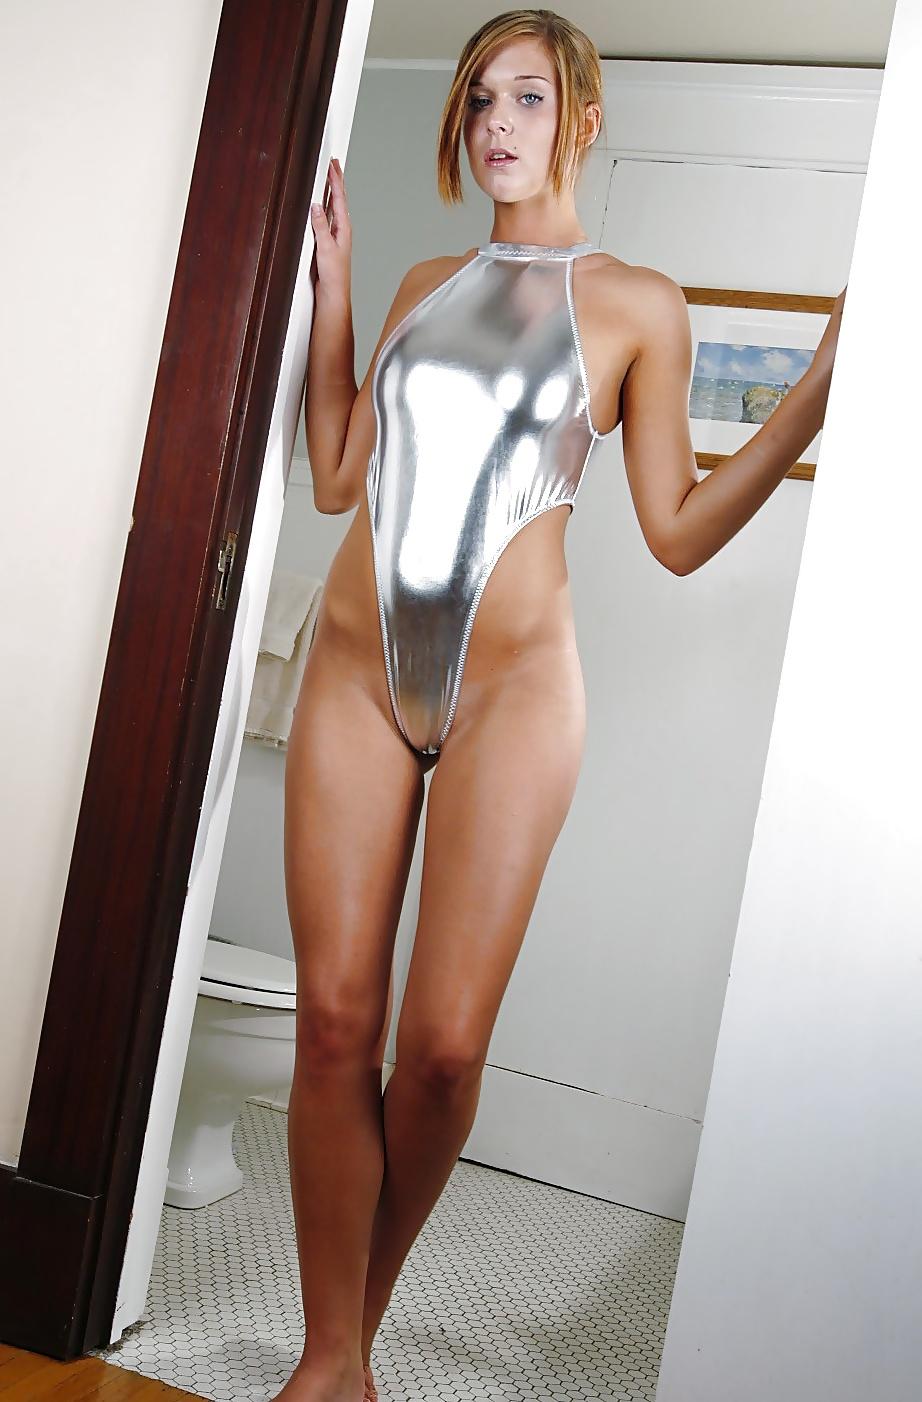 Hd one piece swimsuit xxx sex hard